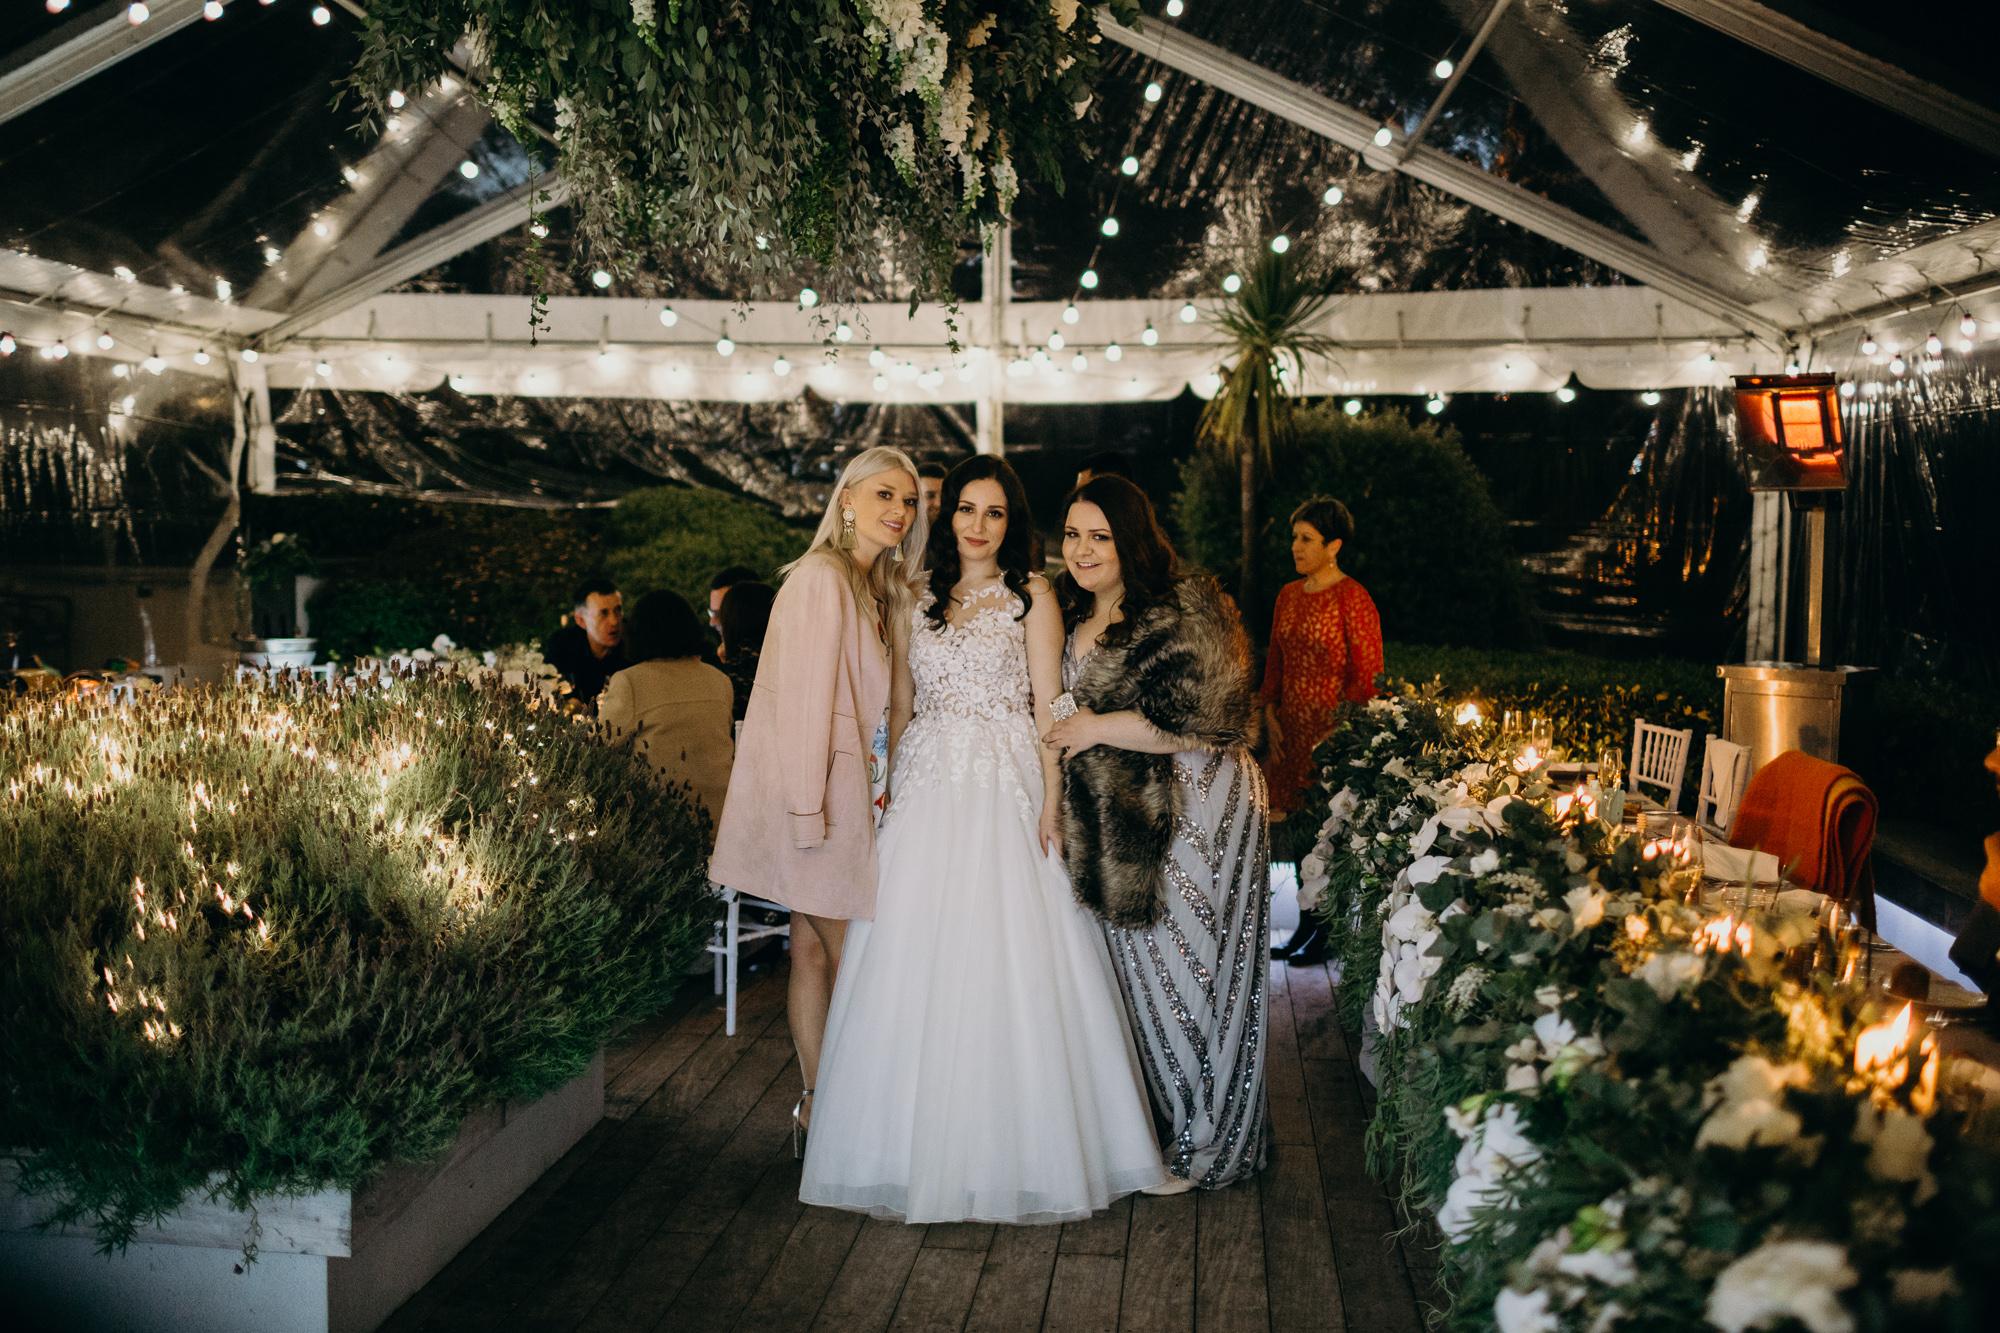 Winter marquee wedding in Queenstown NZ